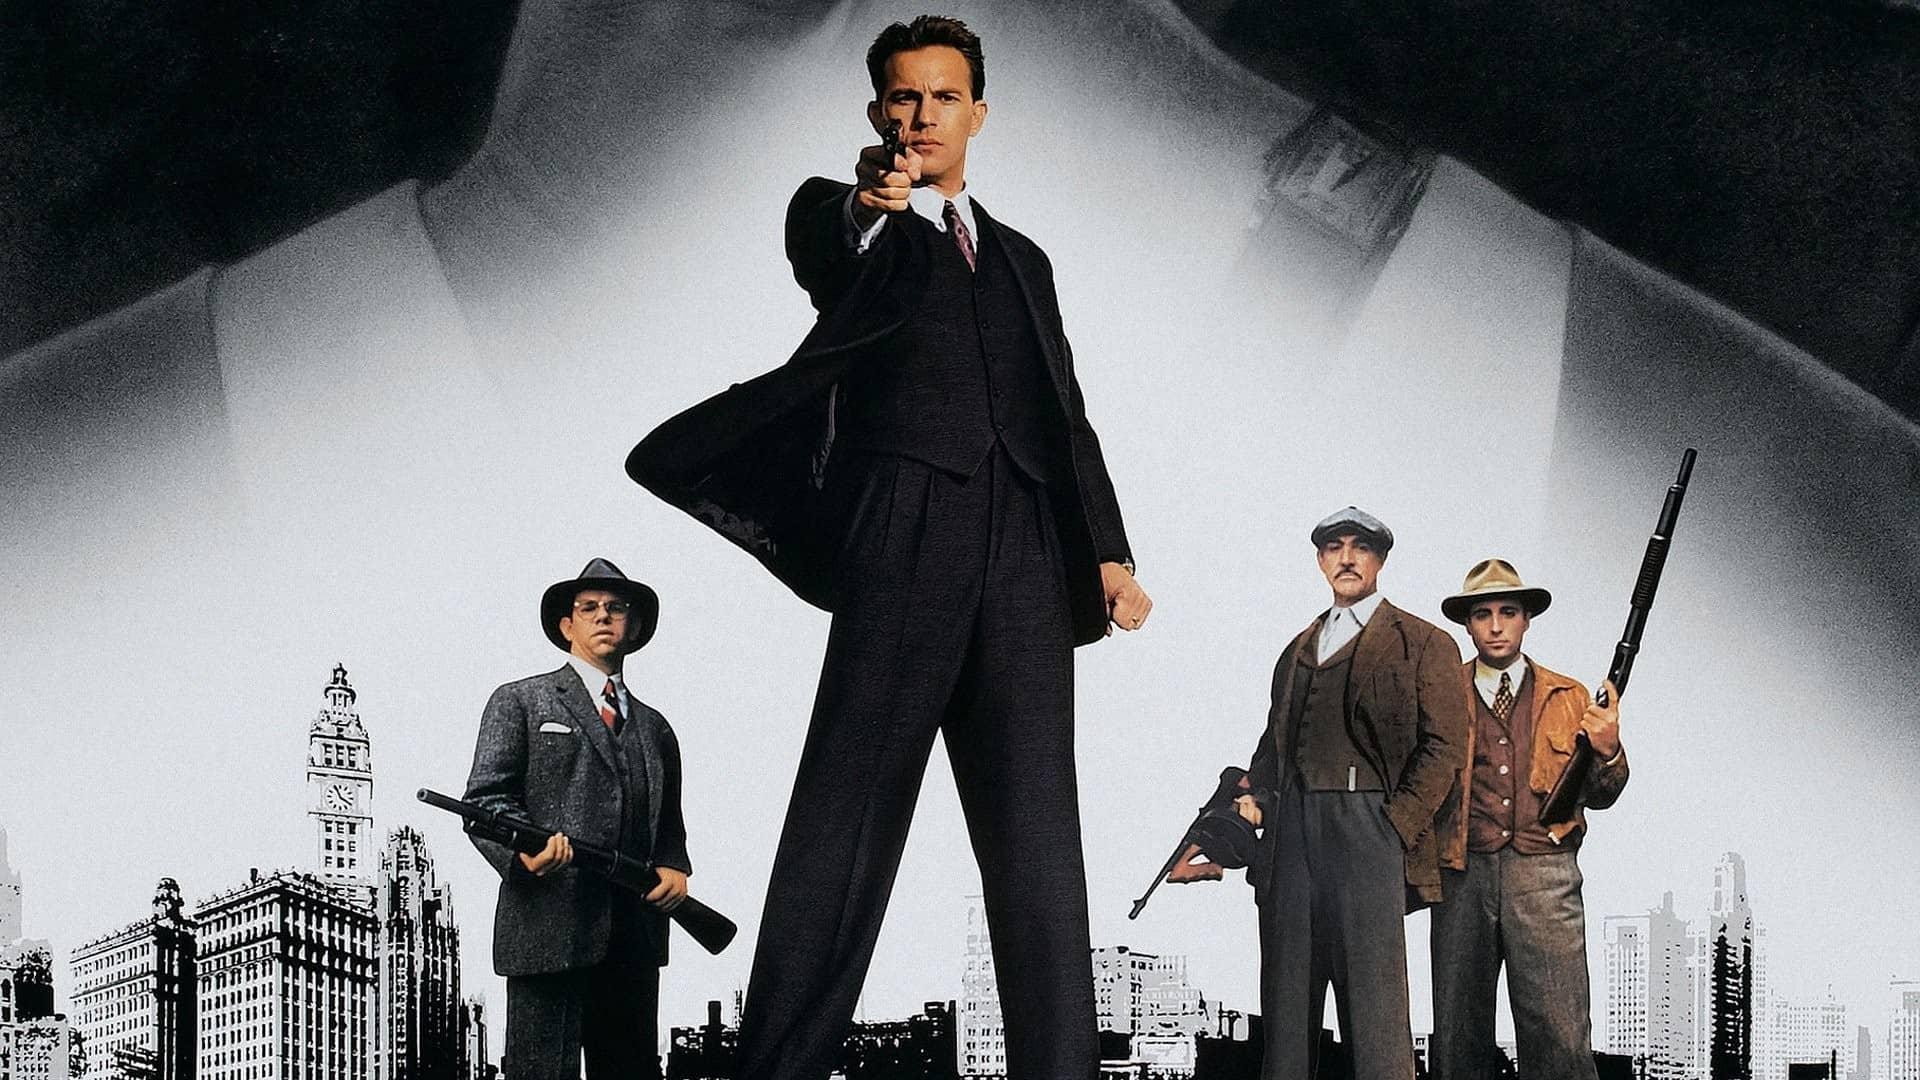 film polizieschi